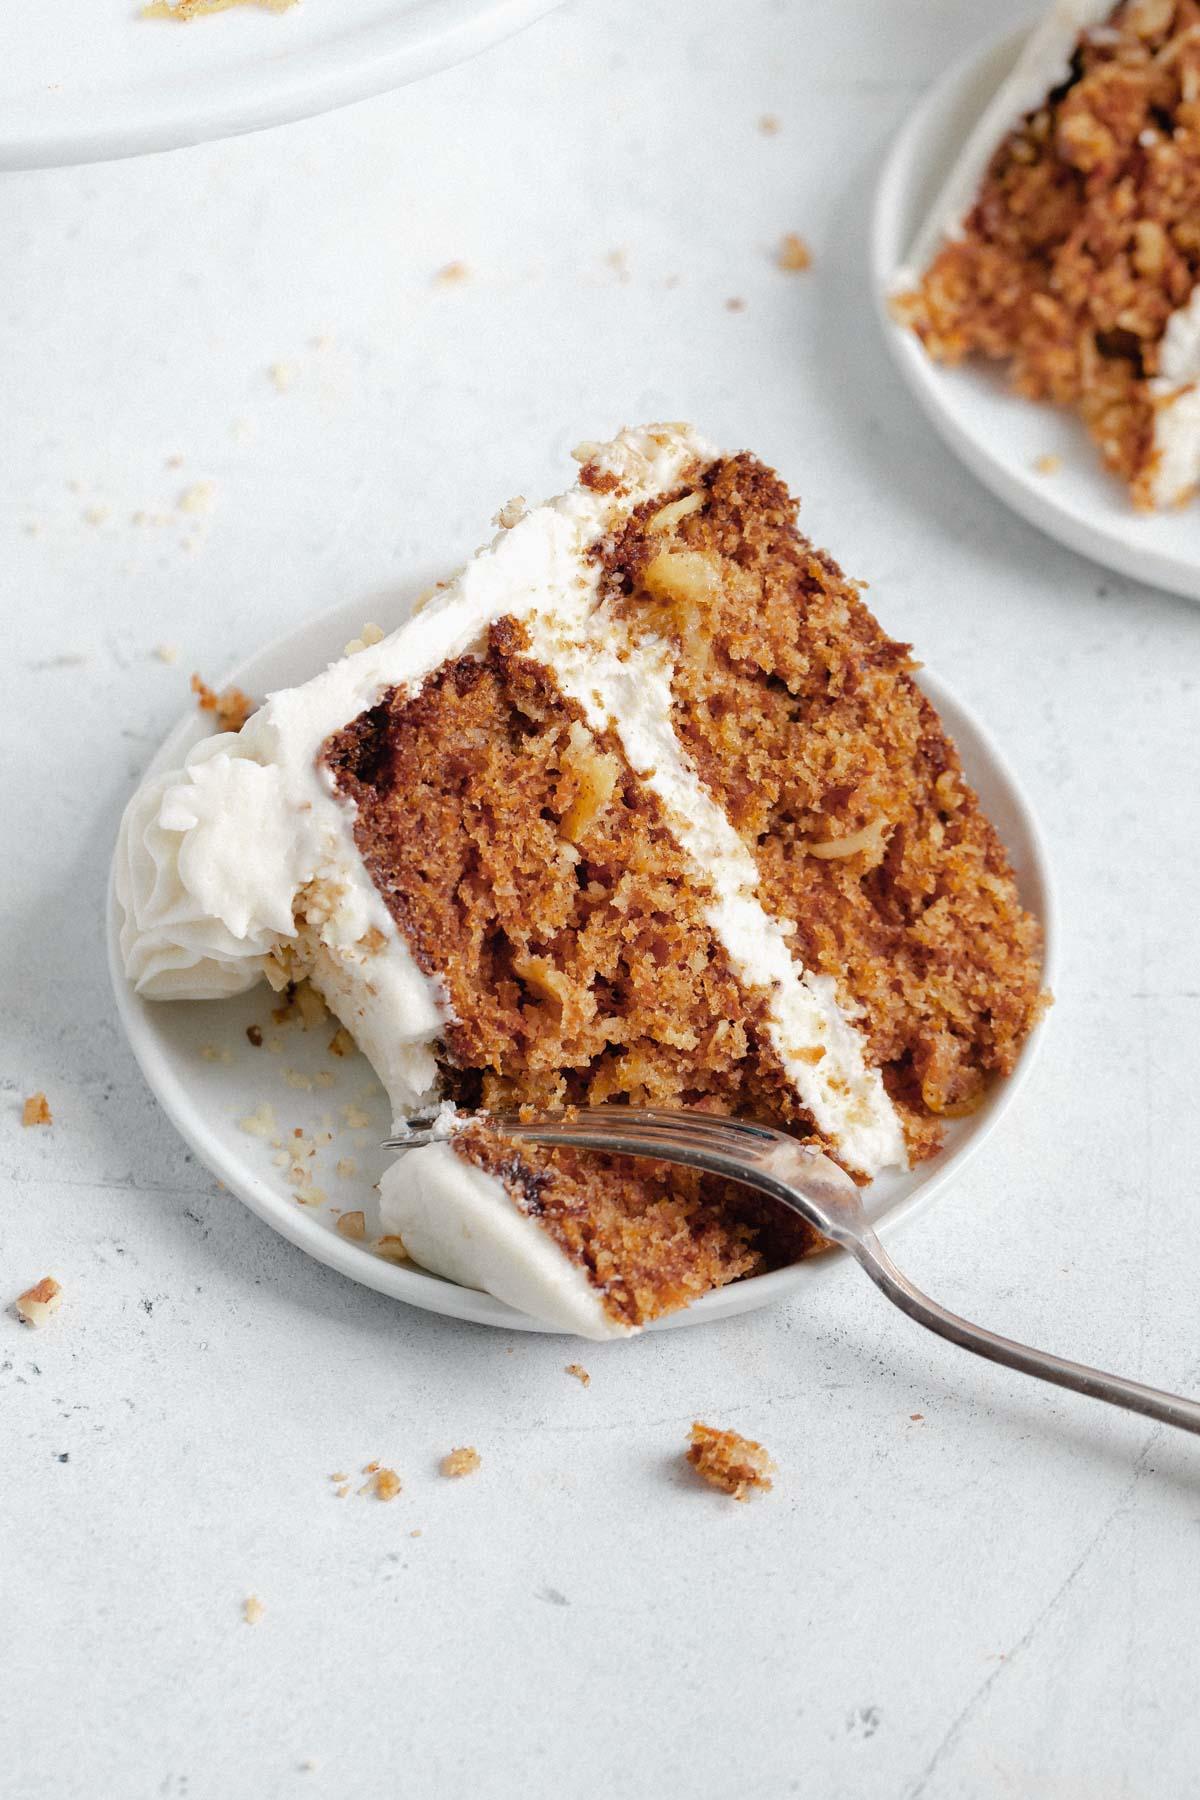 slice of the best carrot cake